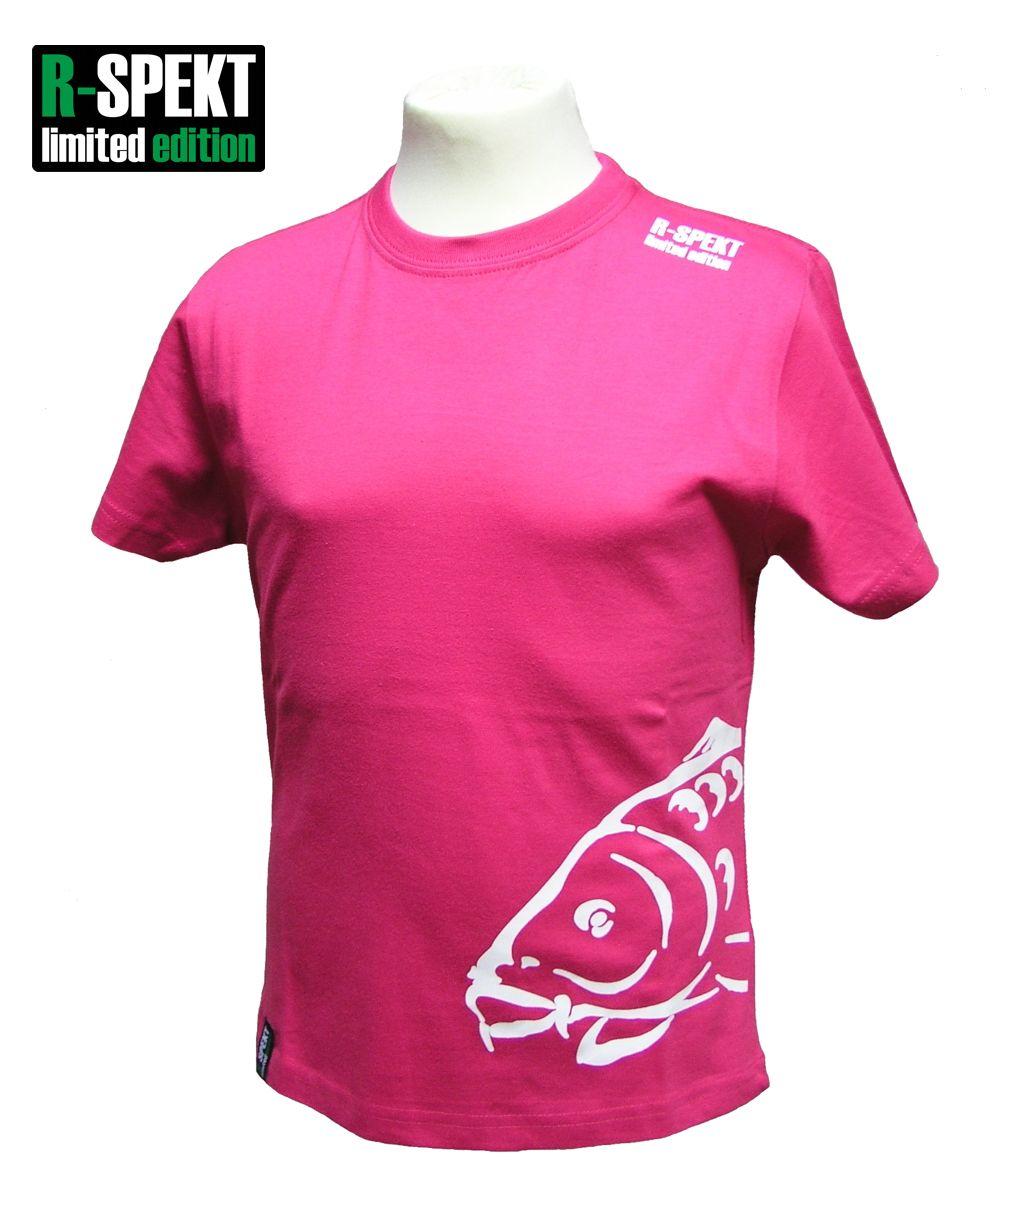 R-spekt detské tričko carper kids ružové-velikost 5/6 yrs